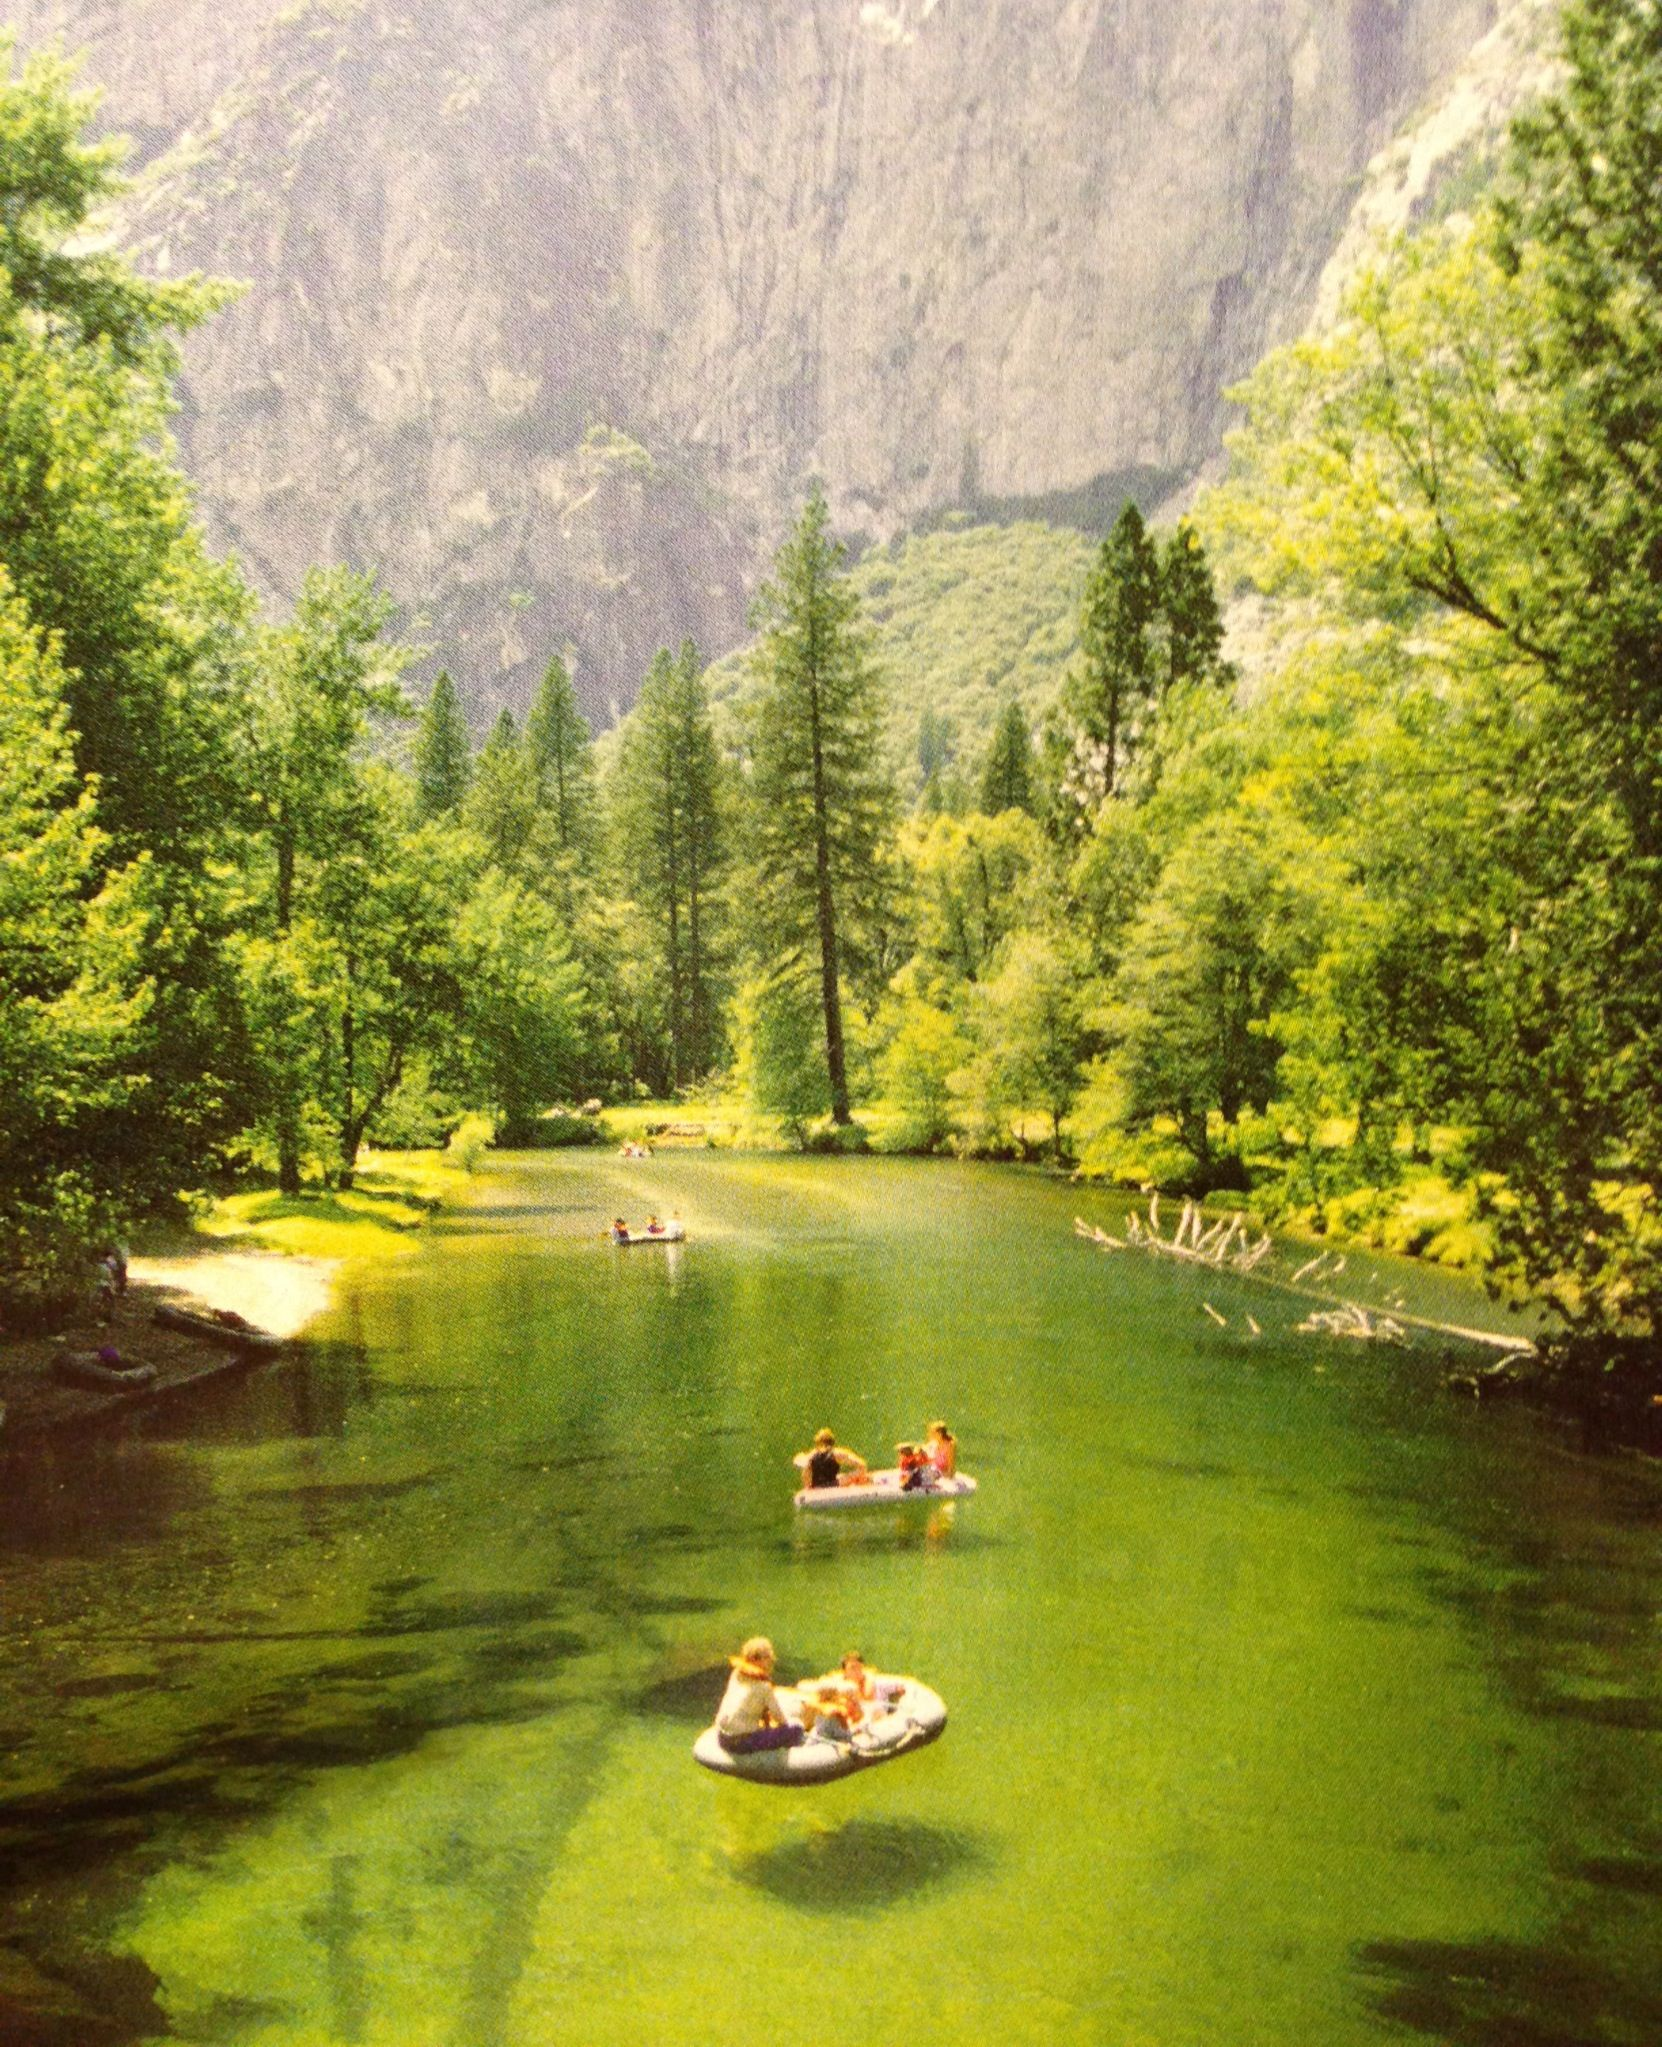 Yosemite National Park Rivers